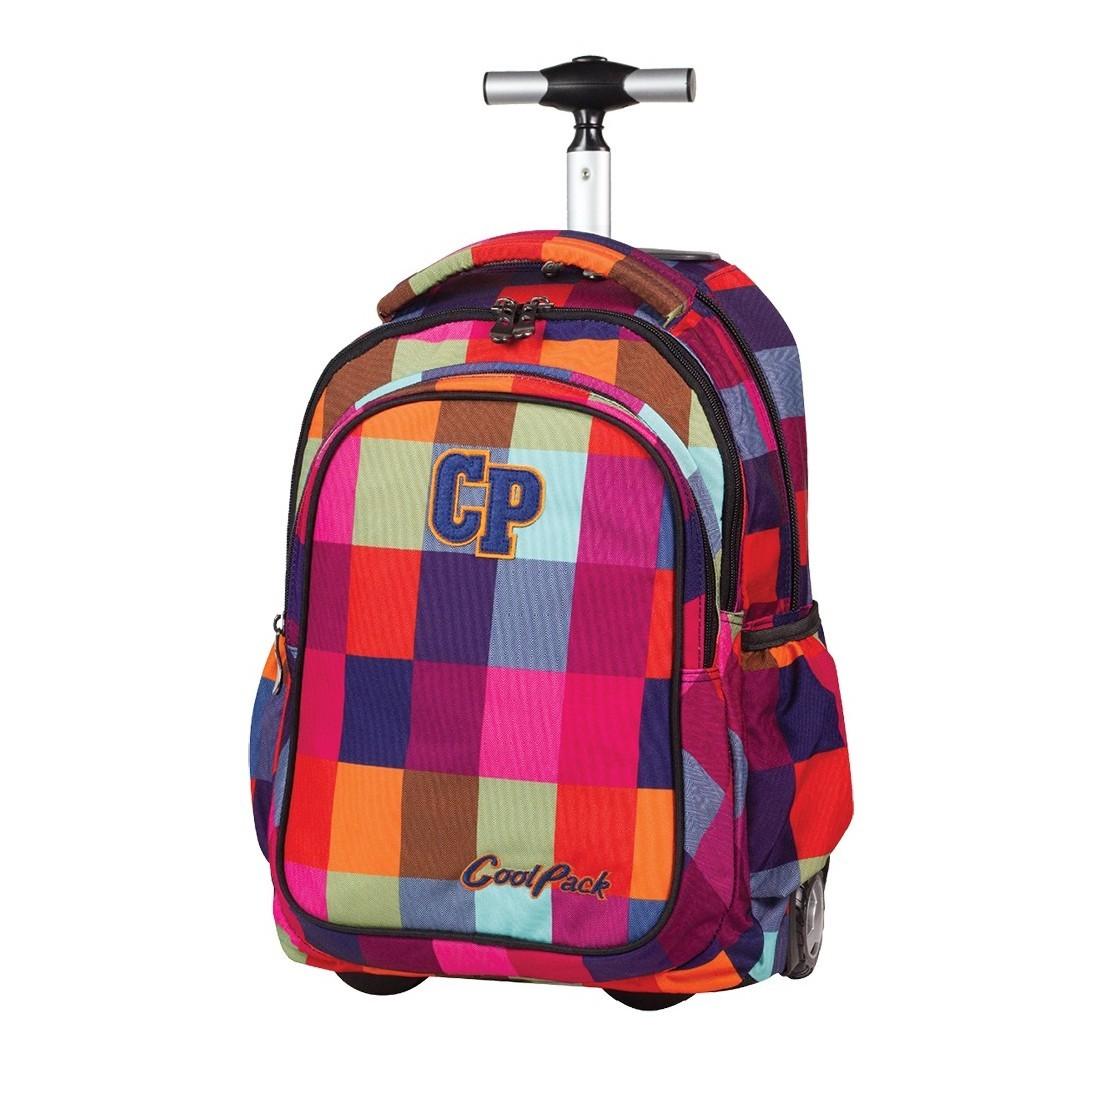 Plecak na kółkach CoolPack Junior MOSAIC w kolorową kratkę CP 003a - plecak-tornister.pl